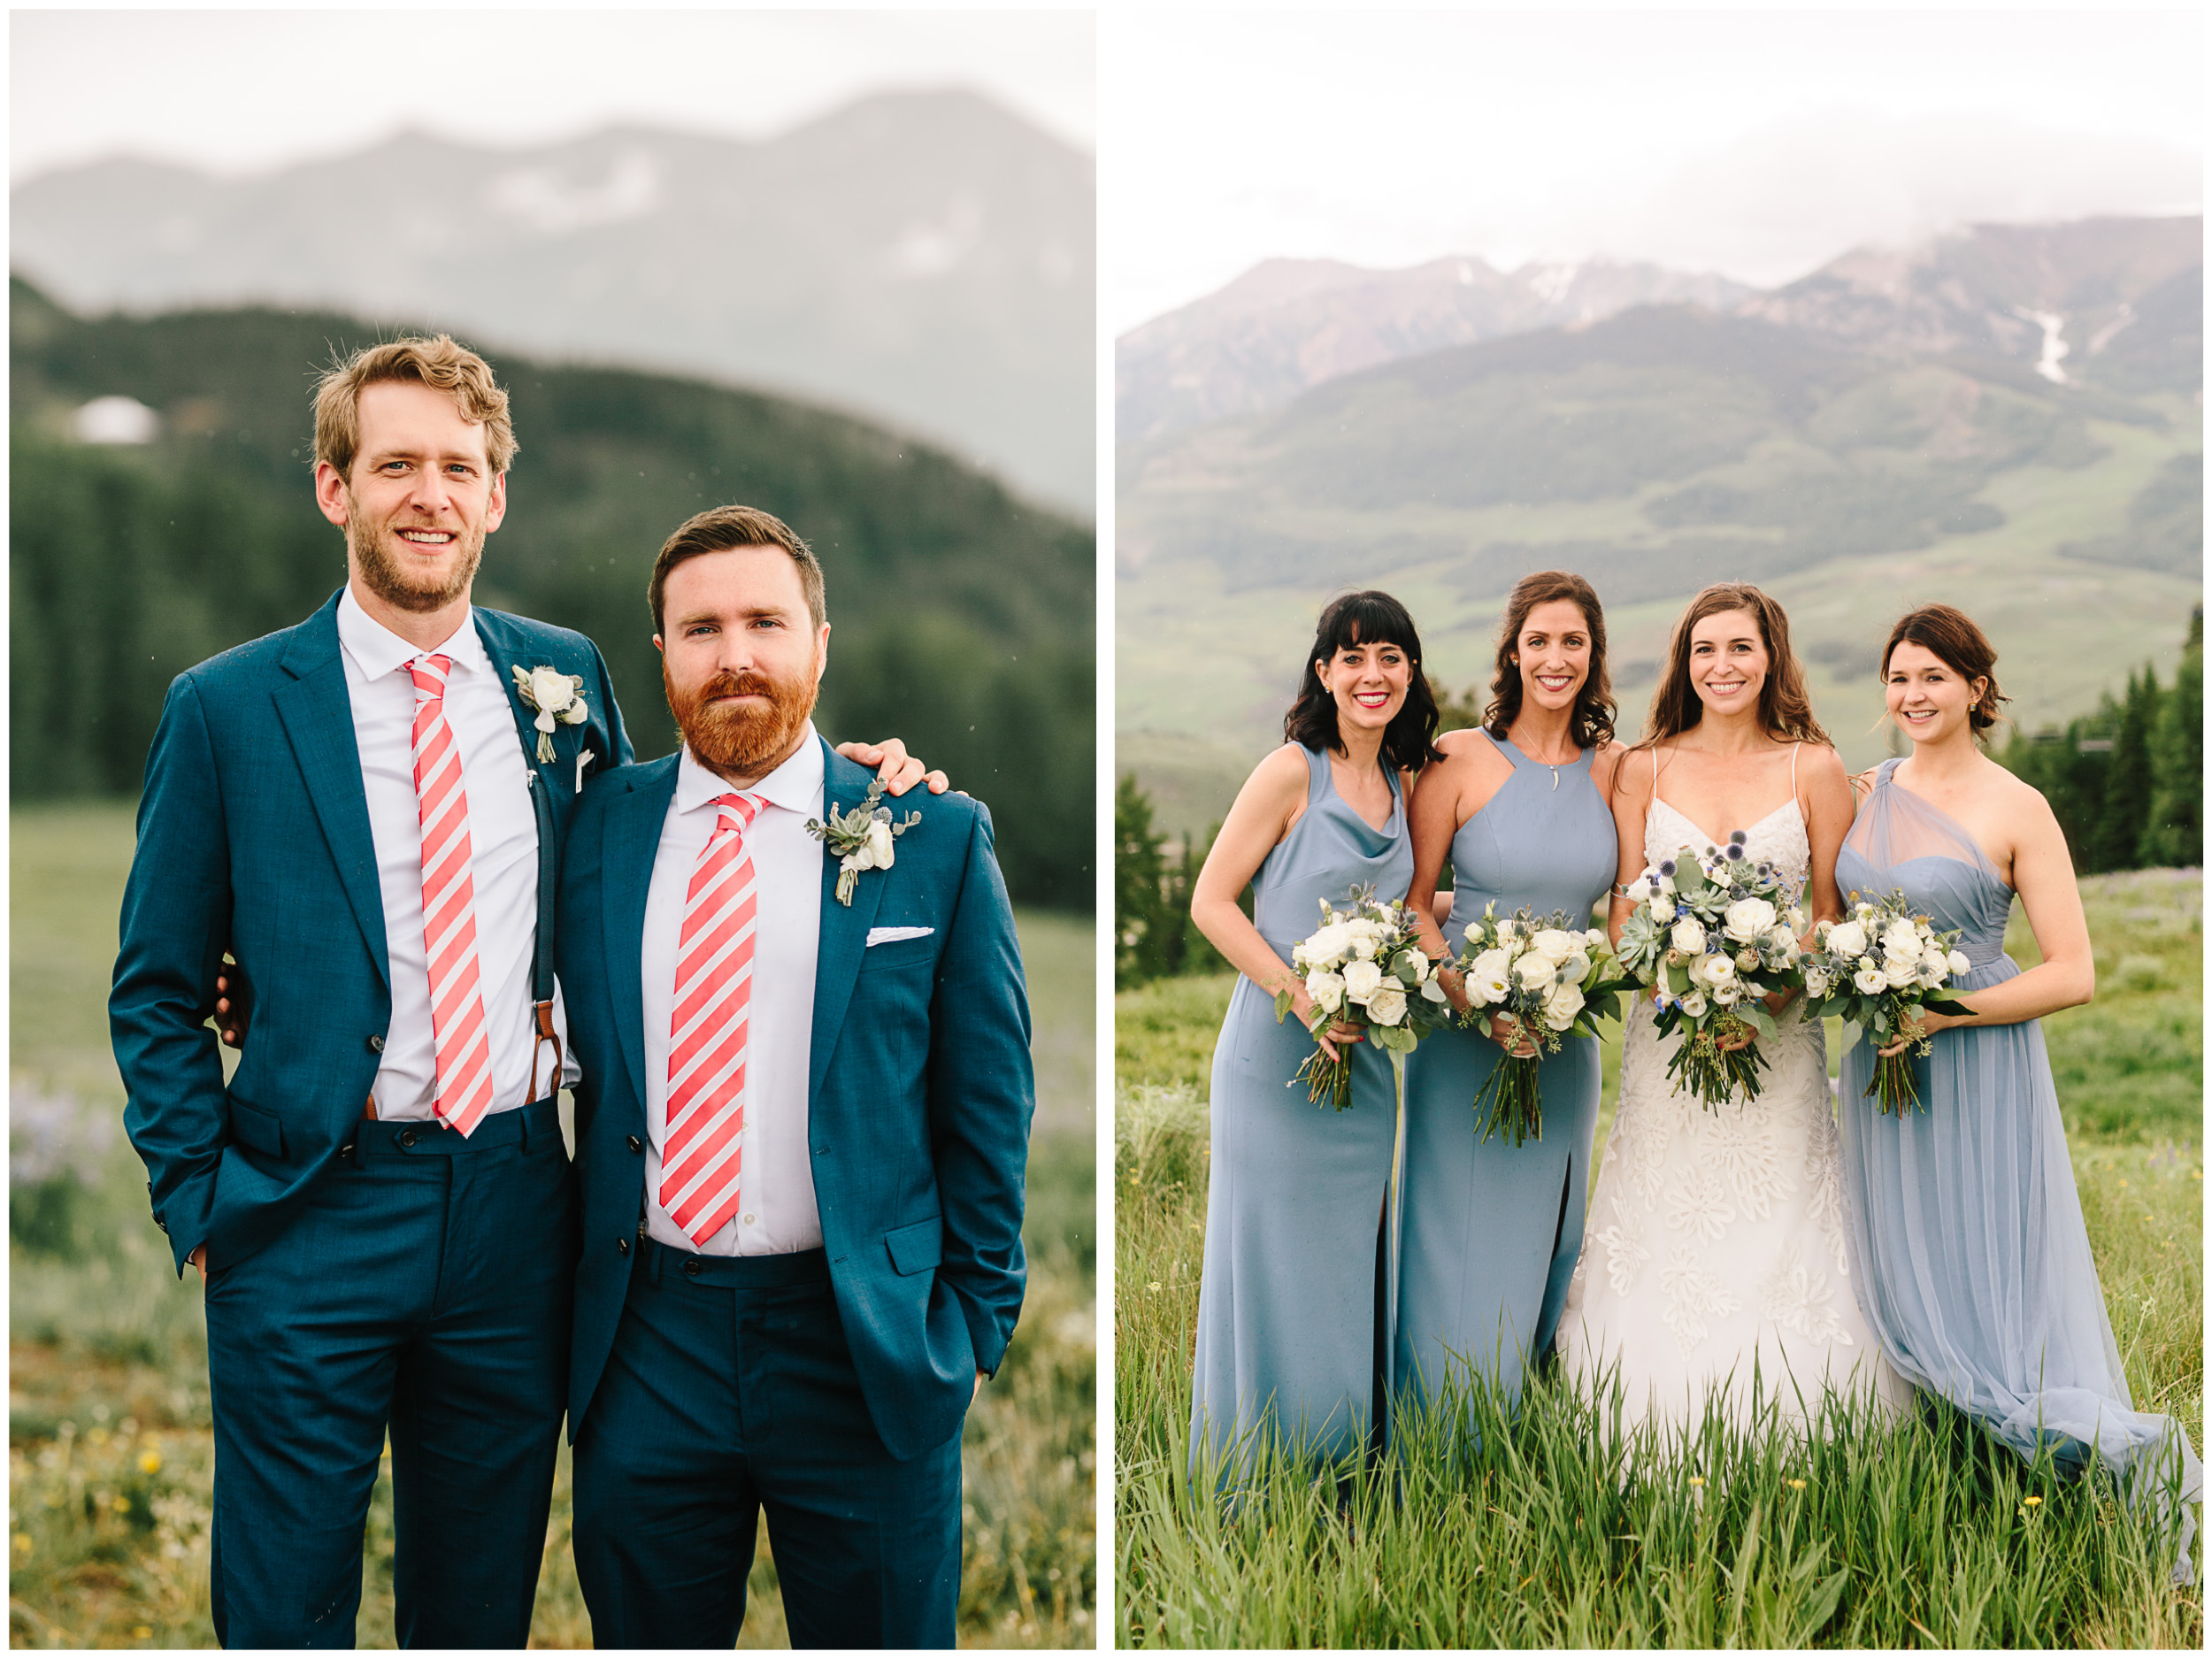 crested_butte_wedding_75.jpg